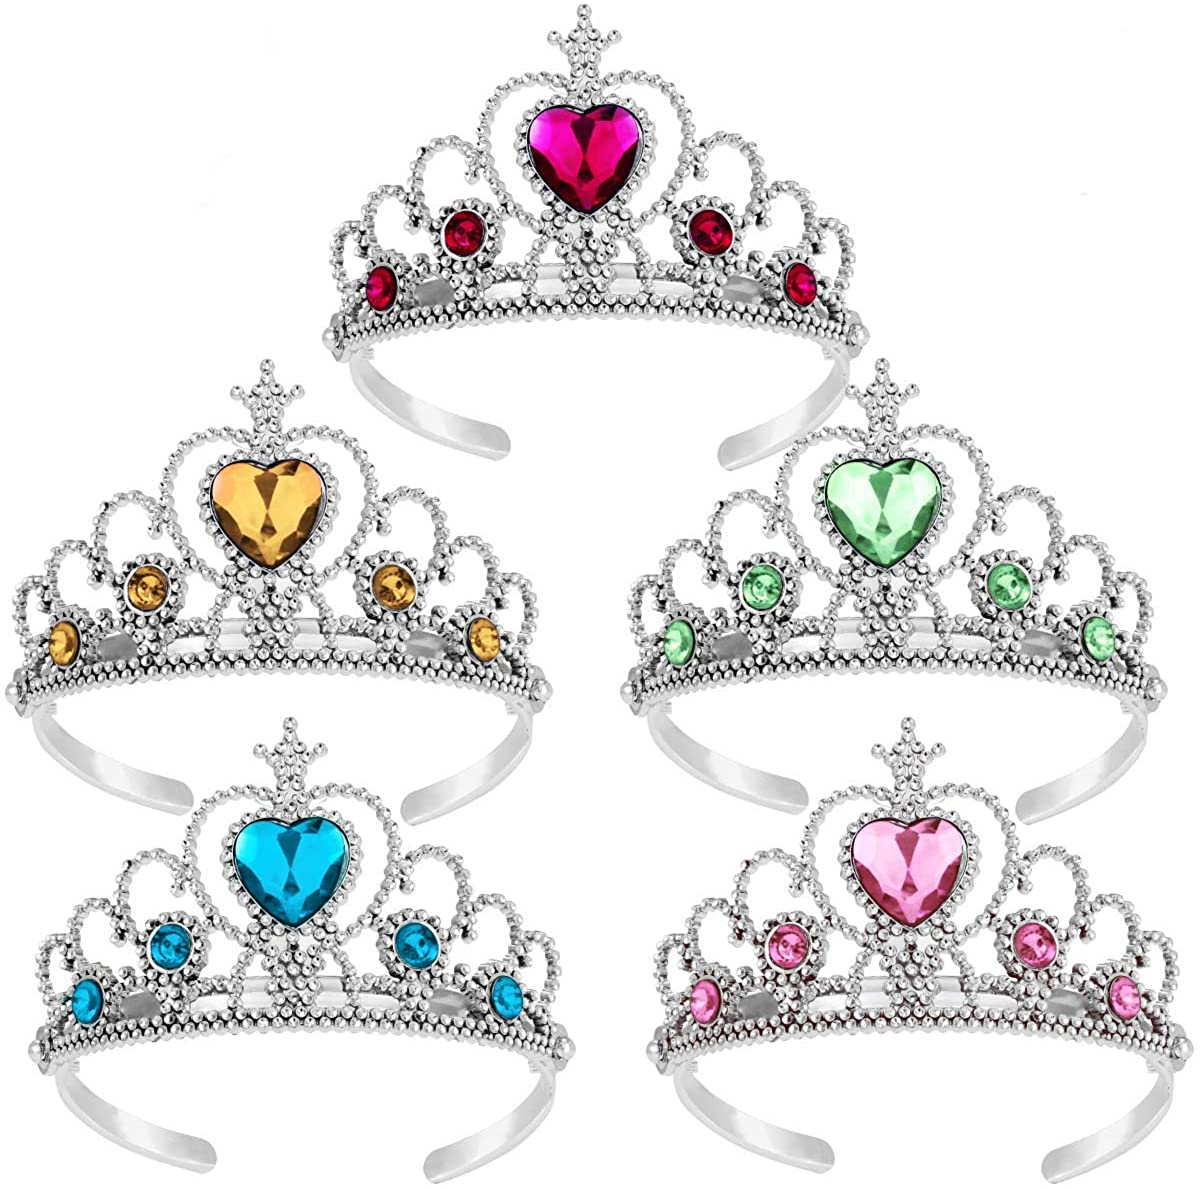 Princess Tiara Crown Set,Girls Dress up Party Accessories,5pcs